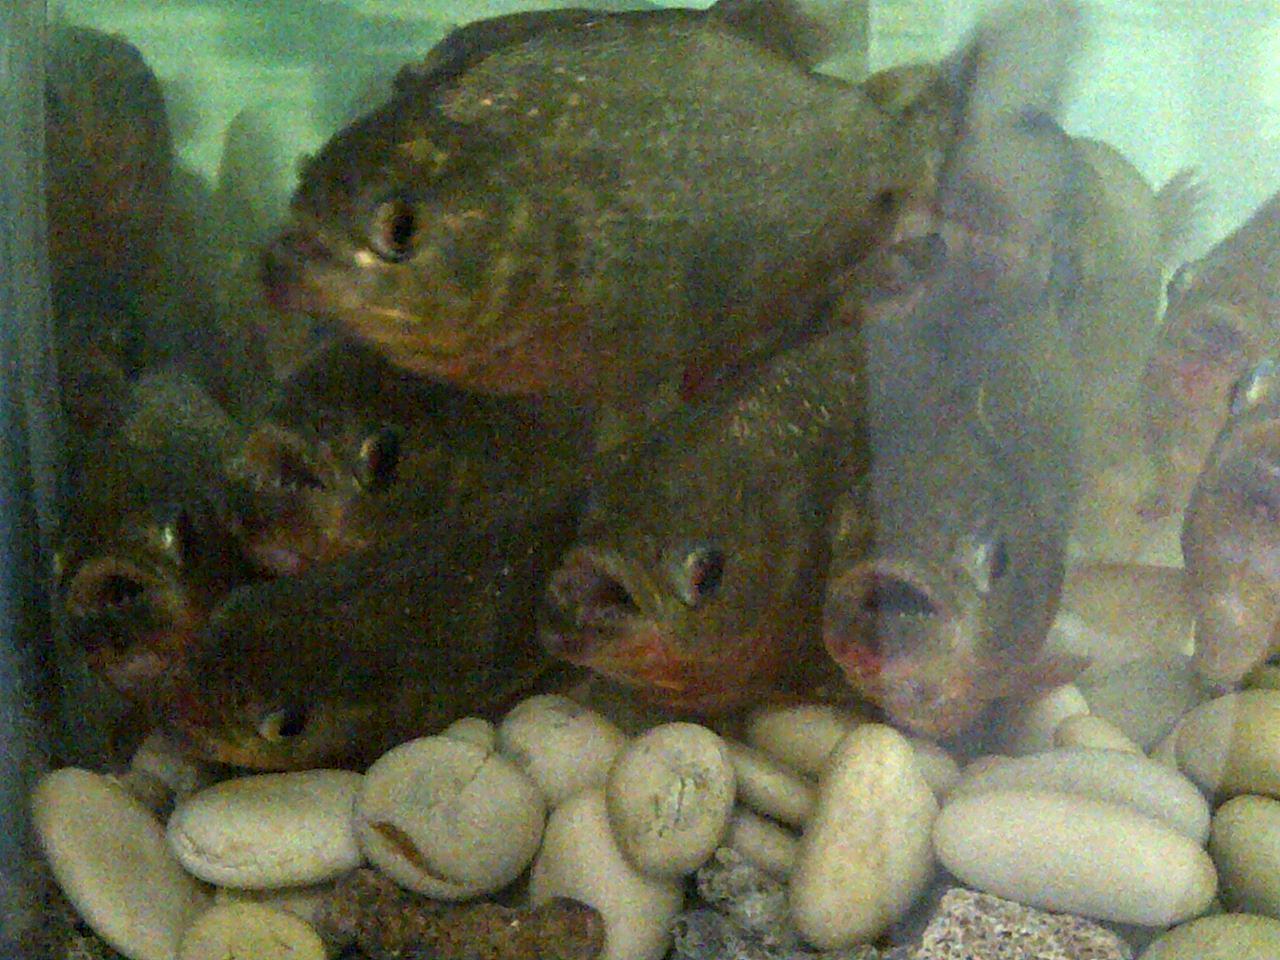 jual ikan piranha redbelly